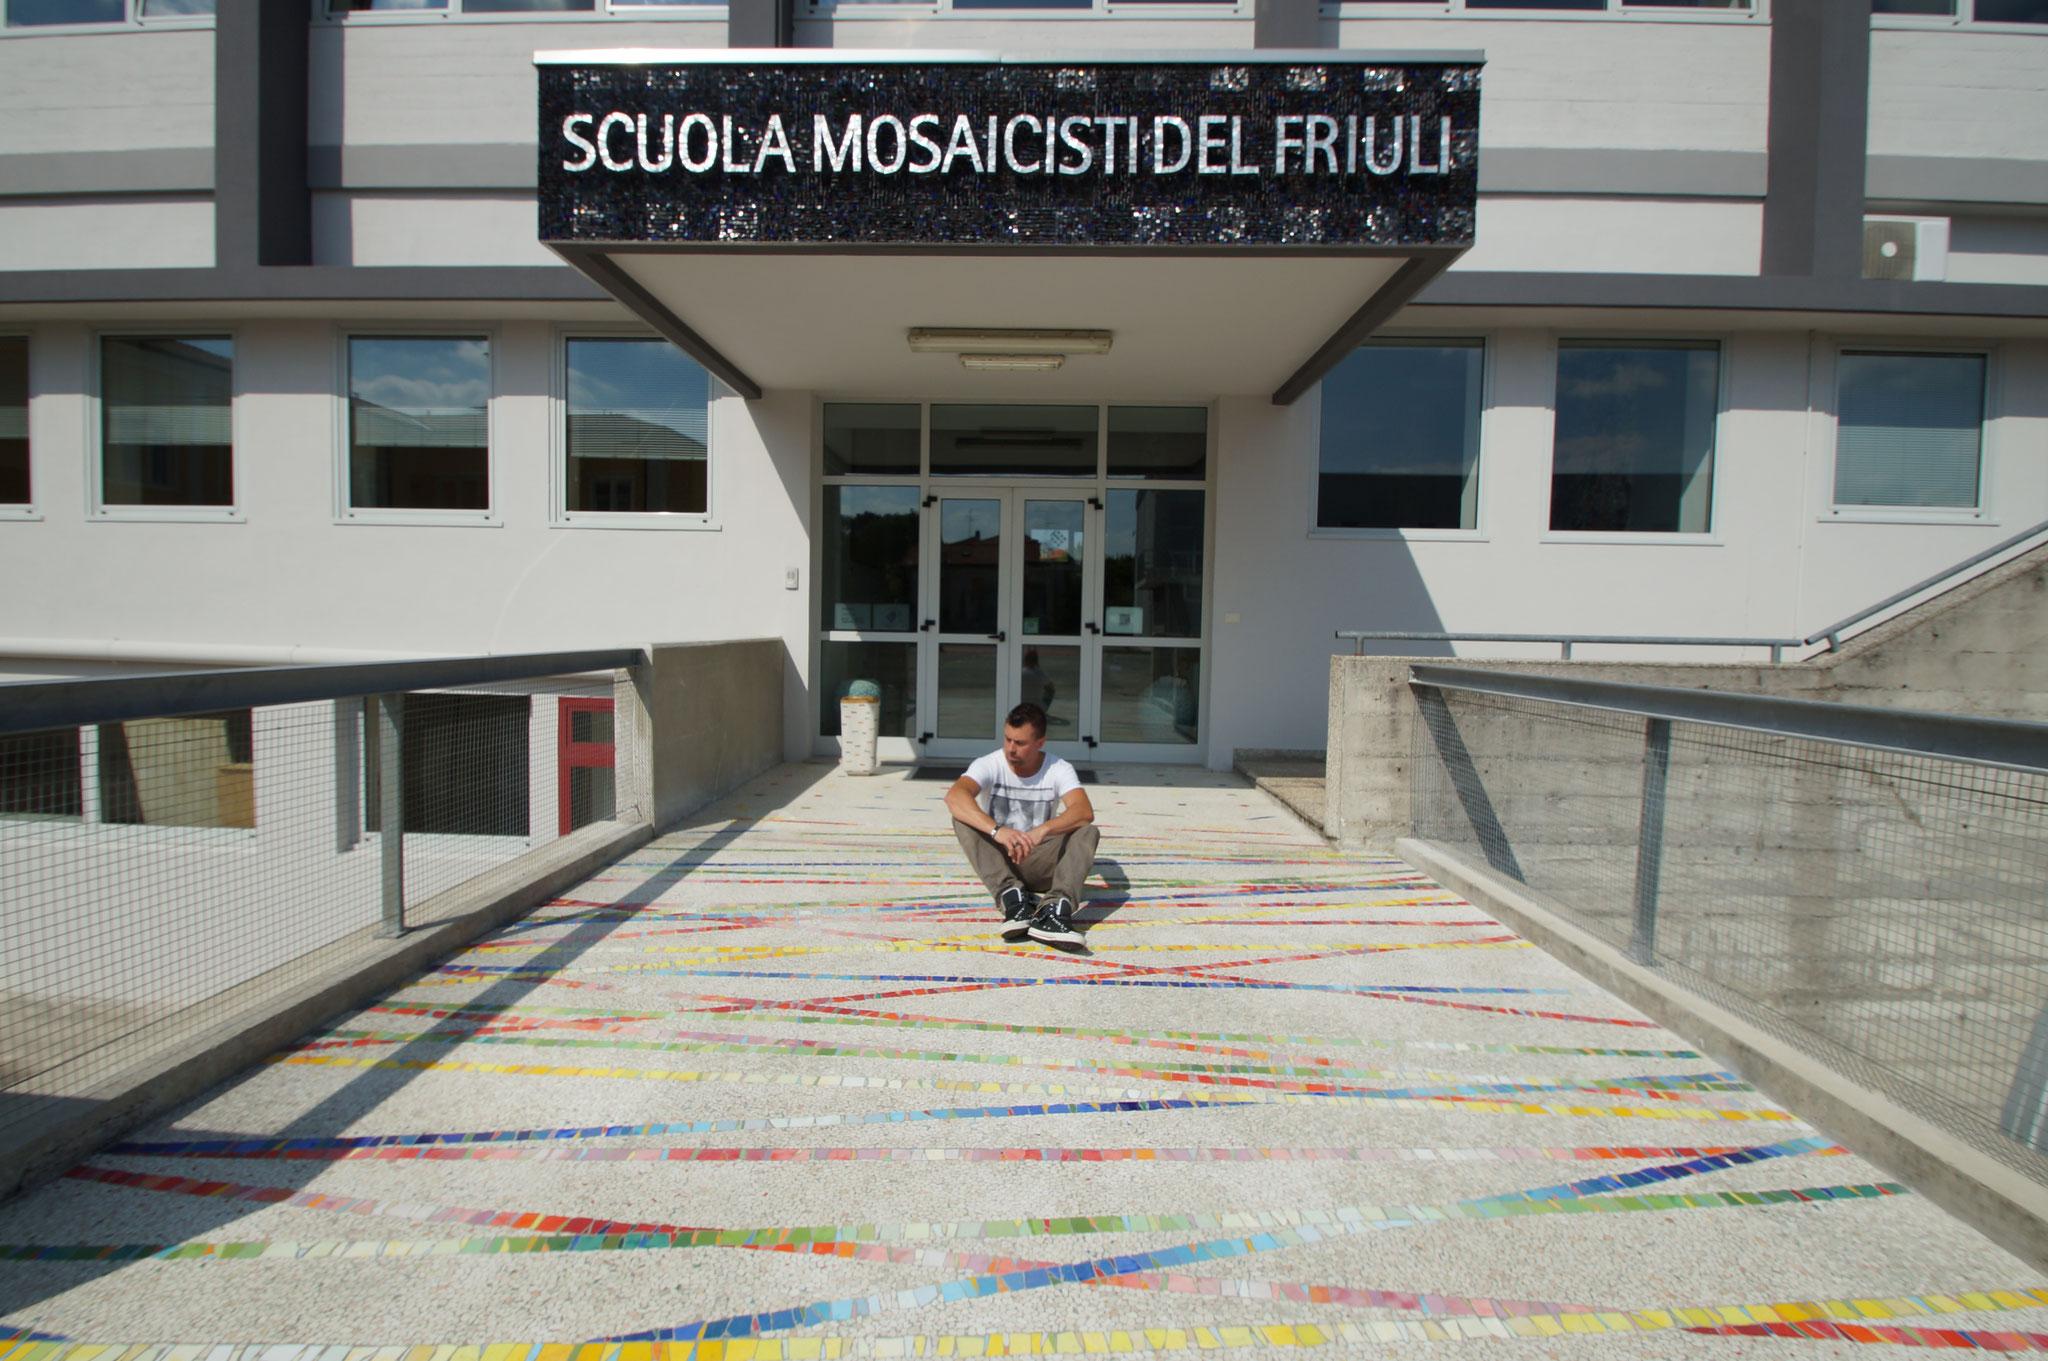 Opleiding Scuola Mosaicisti Del Friulli, Italië